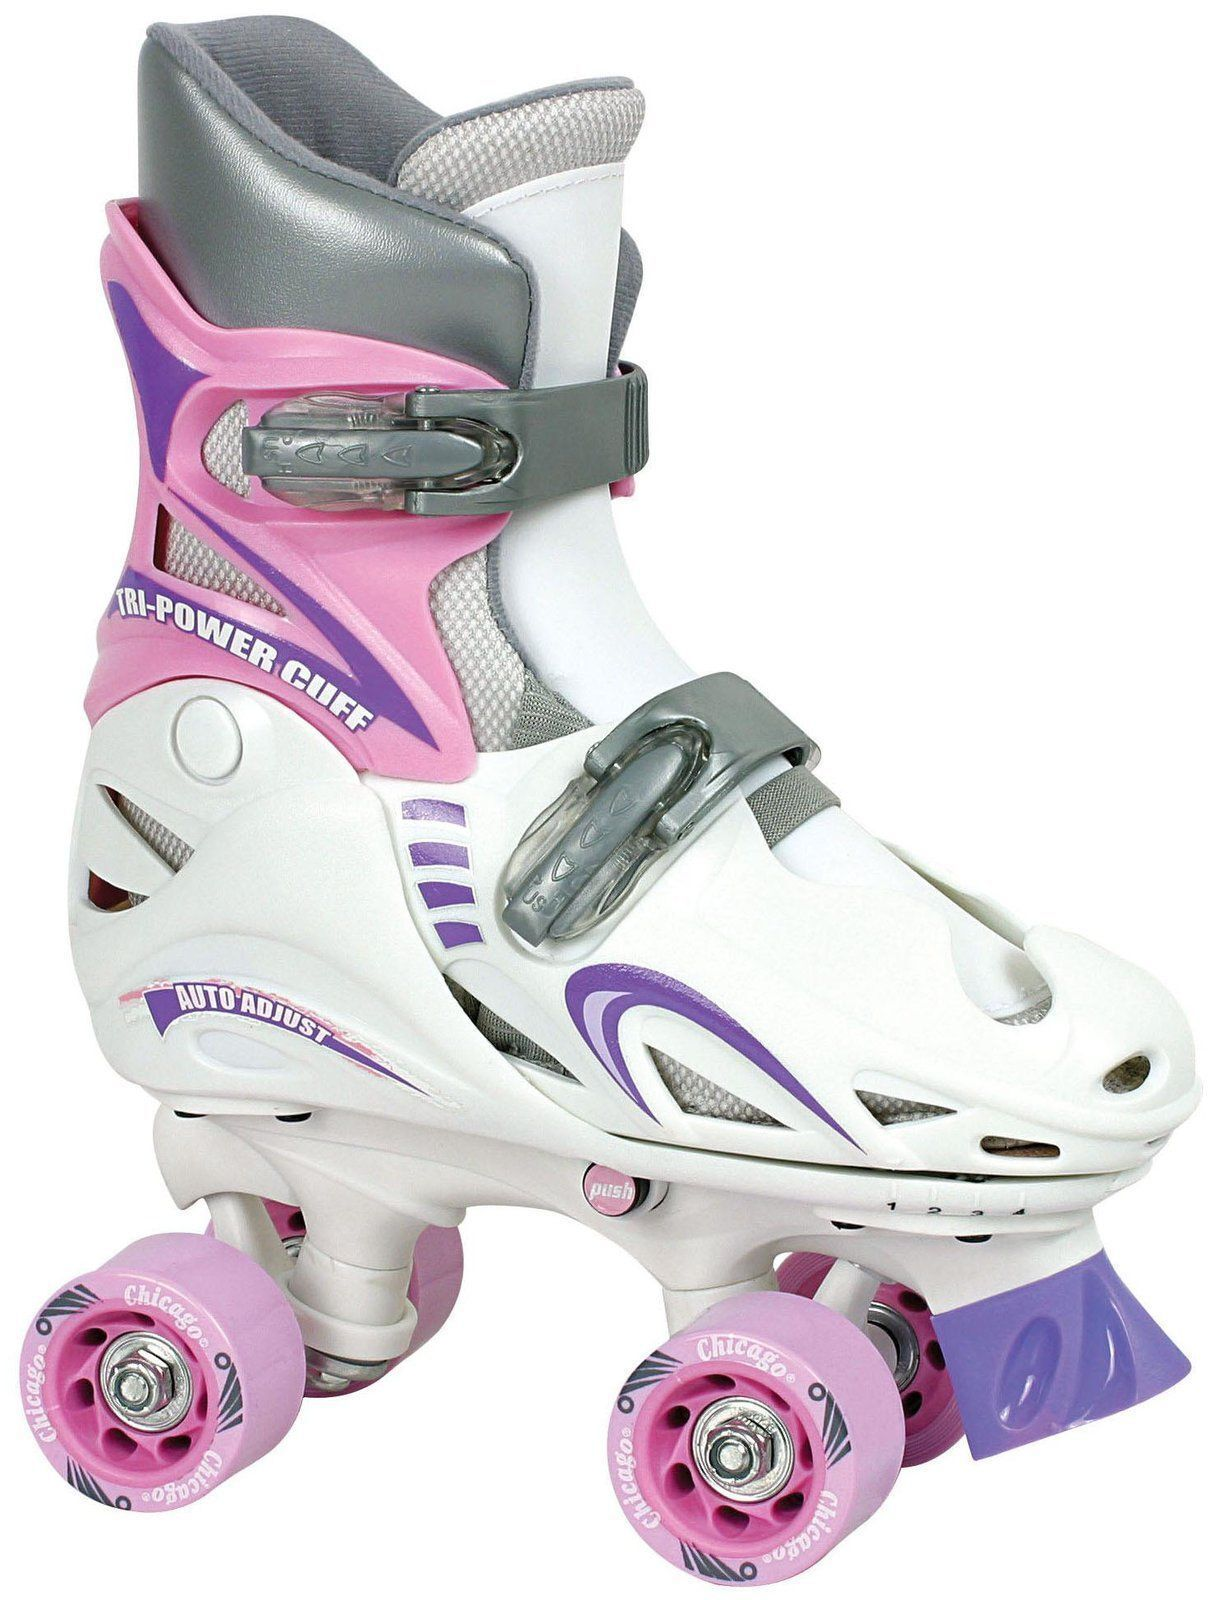 Quad roller skates amazon - Chicago Girls Adjustable Quad Skate